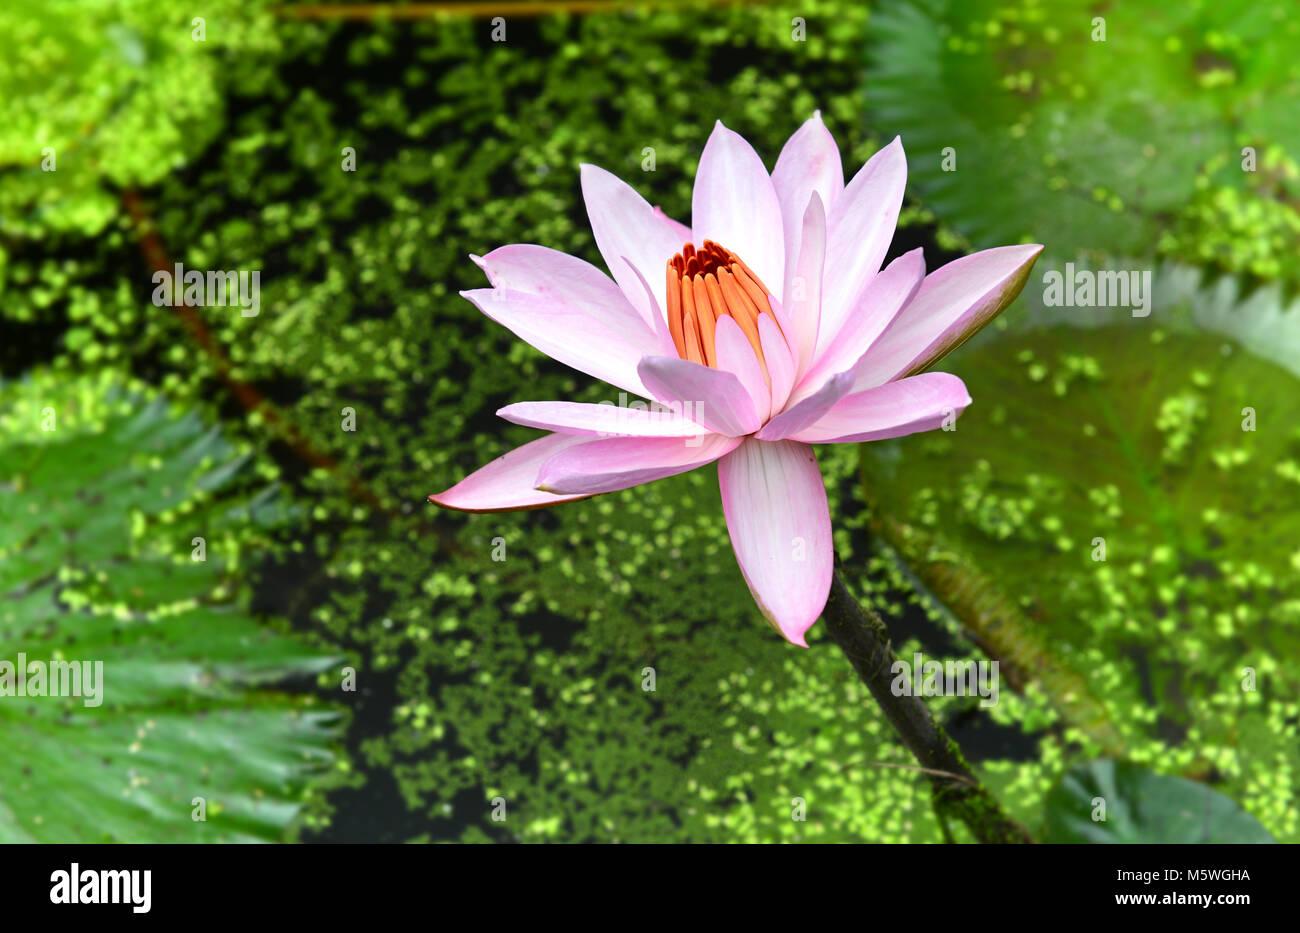 thailand tropical lutus in callage lake stock photo 175738790 alamy